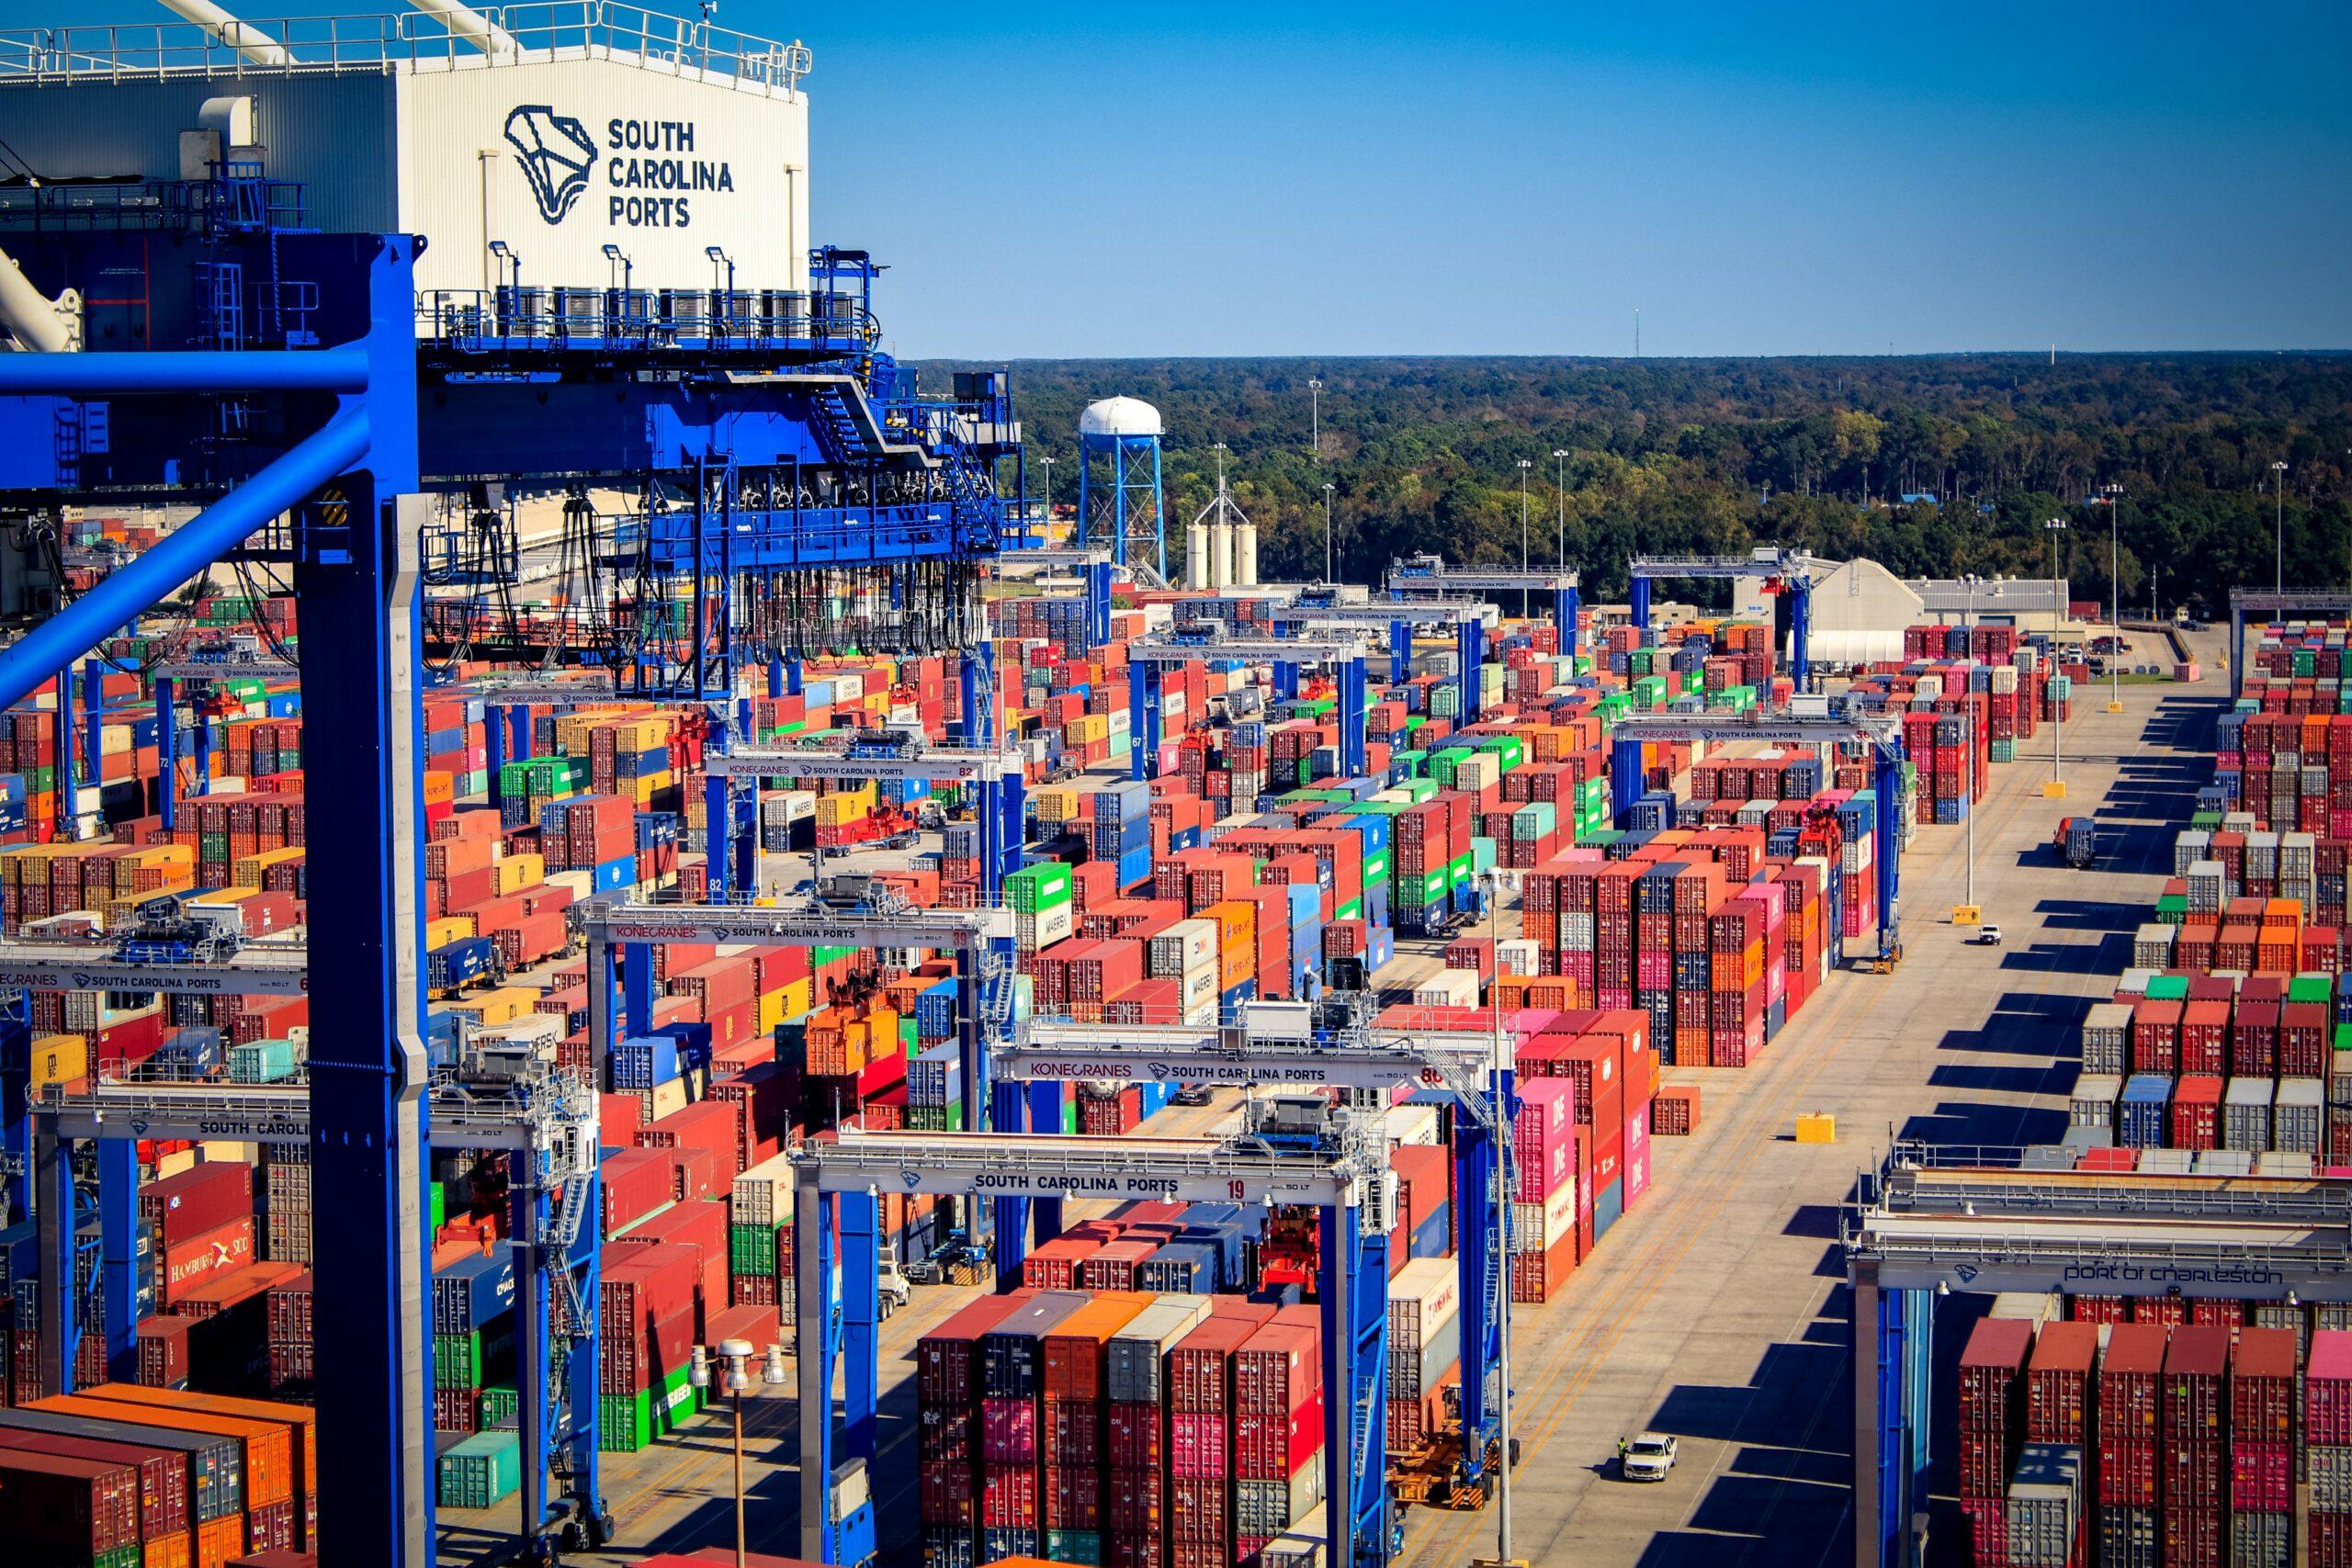 SC Ports receives funding to upgrade truck fleet